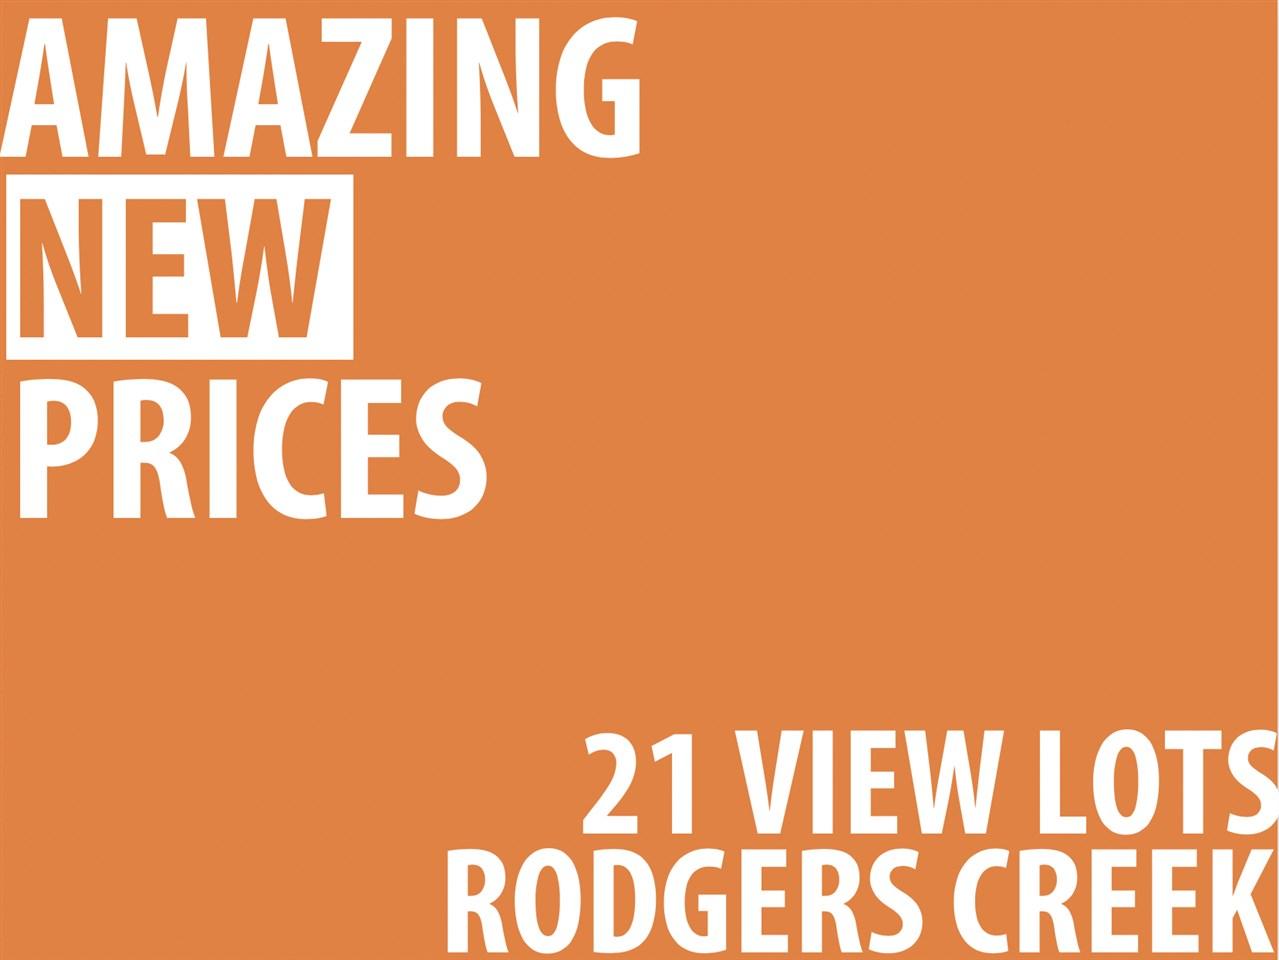 2875 RODGERS CREEK LANE - MLS® # R2423956